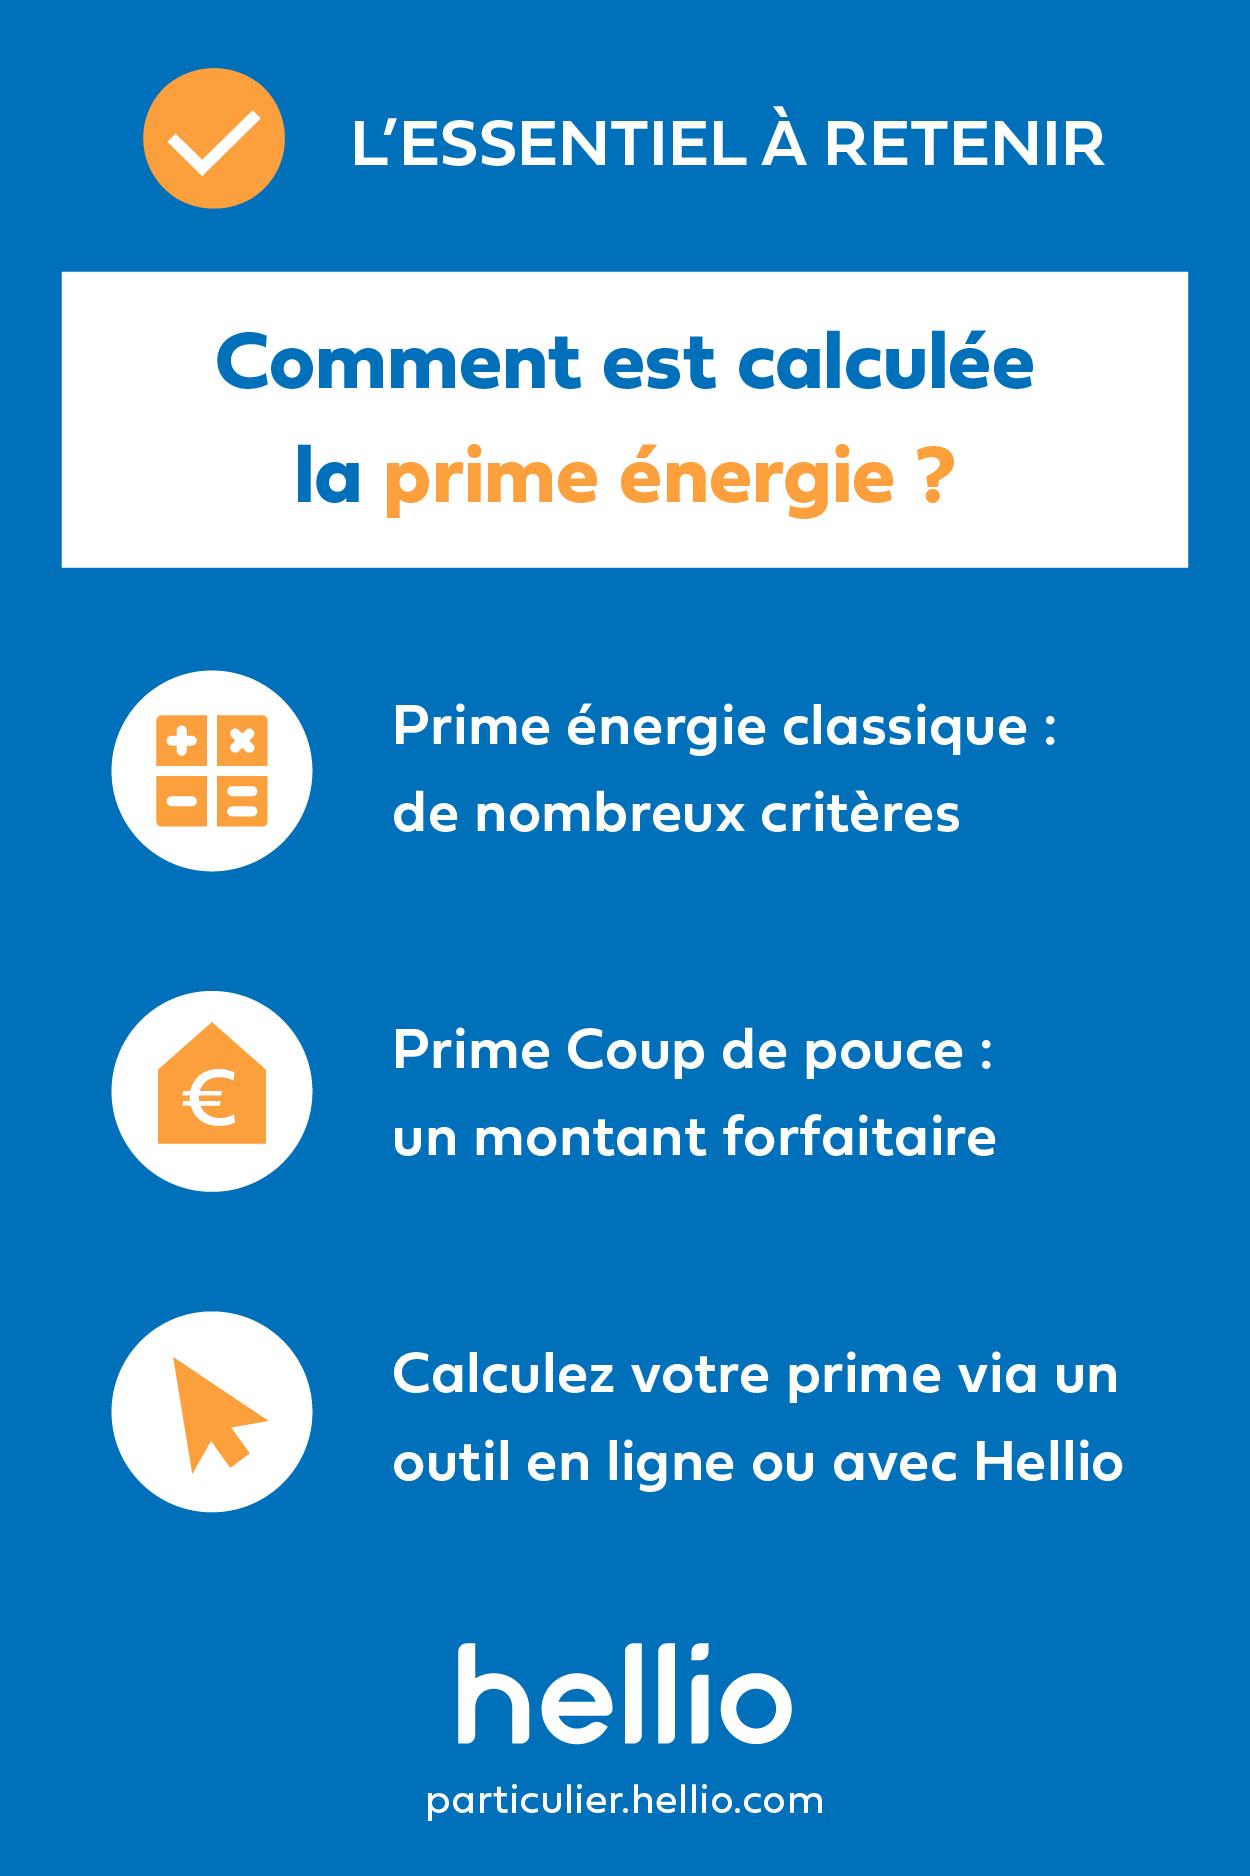 infographie-essentiel-retenir-hellio-particulier-calcul-prime-energie